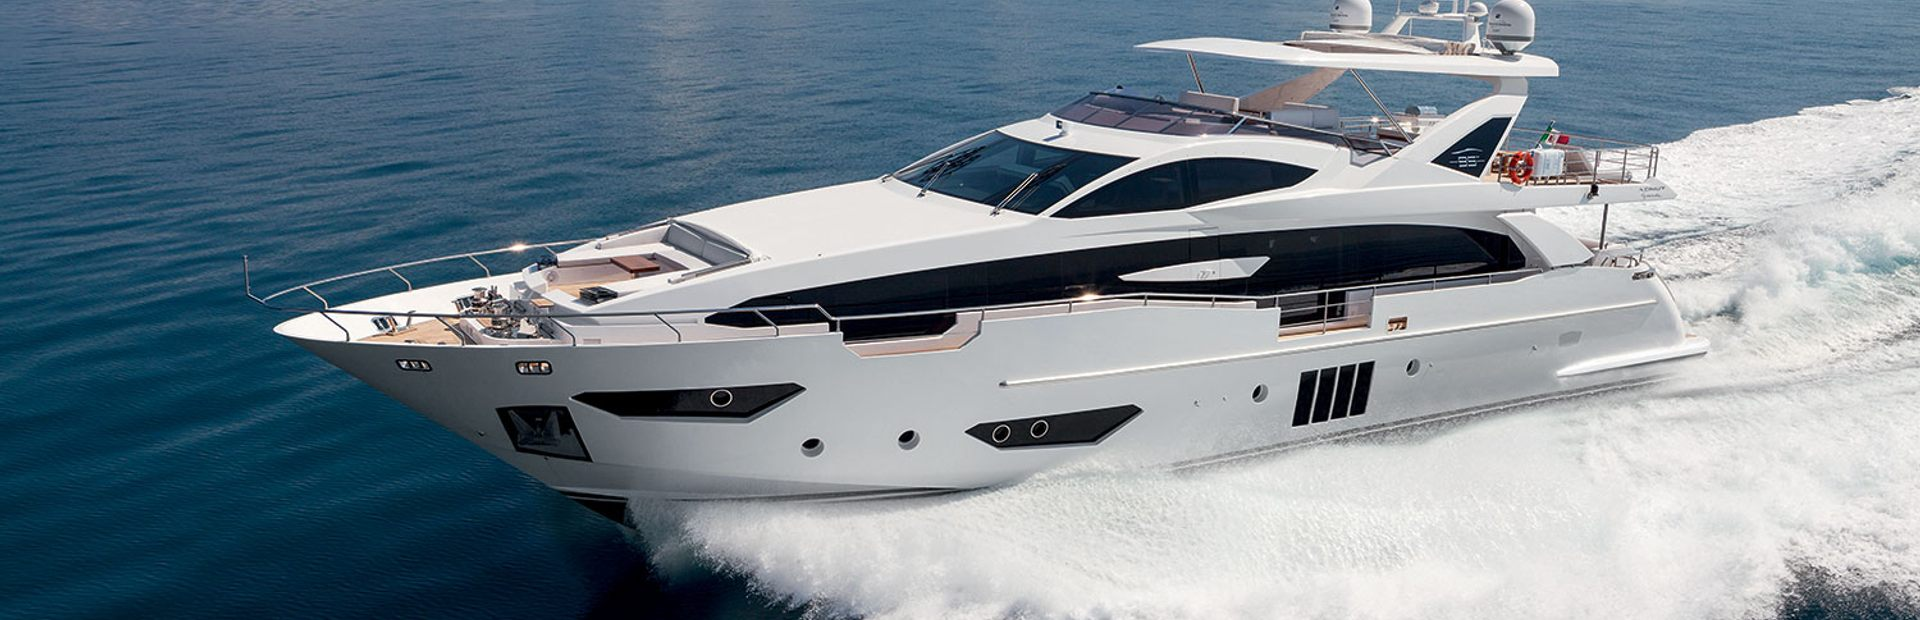 Grande 95 RPH Yacht Charter